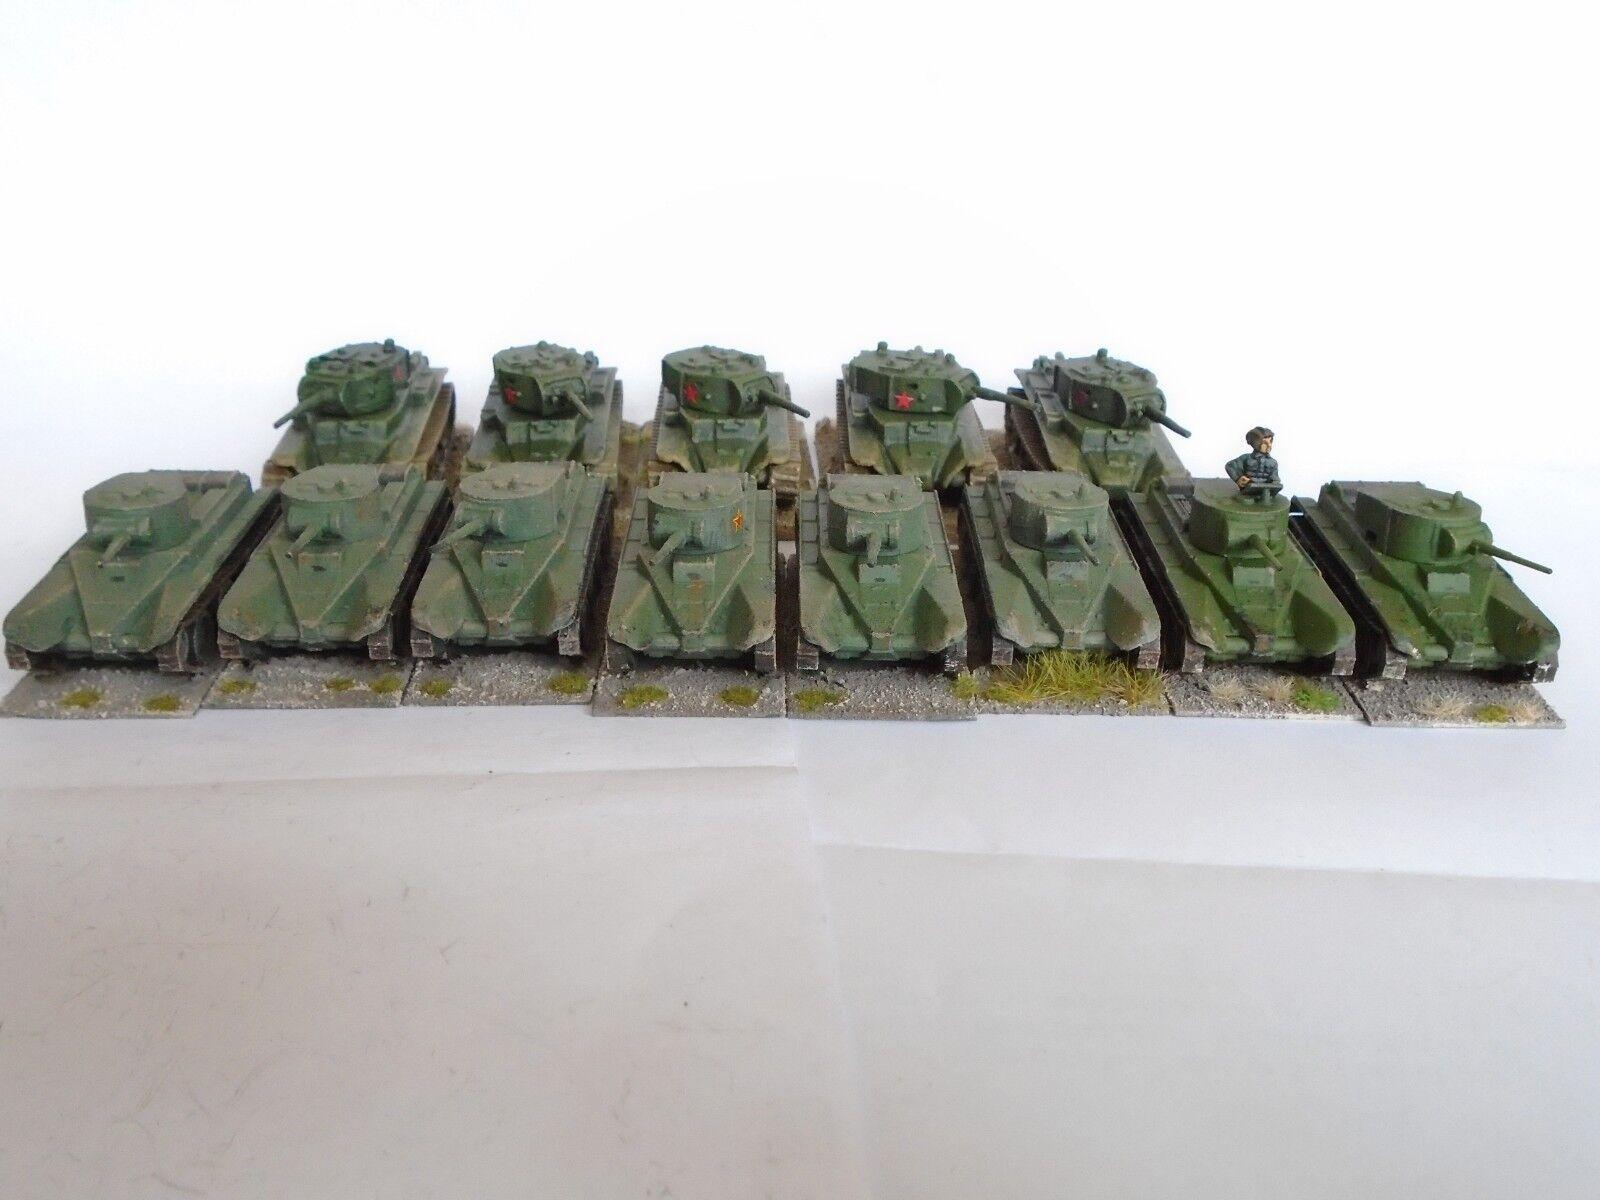 13x 13x 13x 15mm Soviet BT5 tanks  by Zvezda   Gaming Models WW2 Flames of war wargames 07aba2